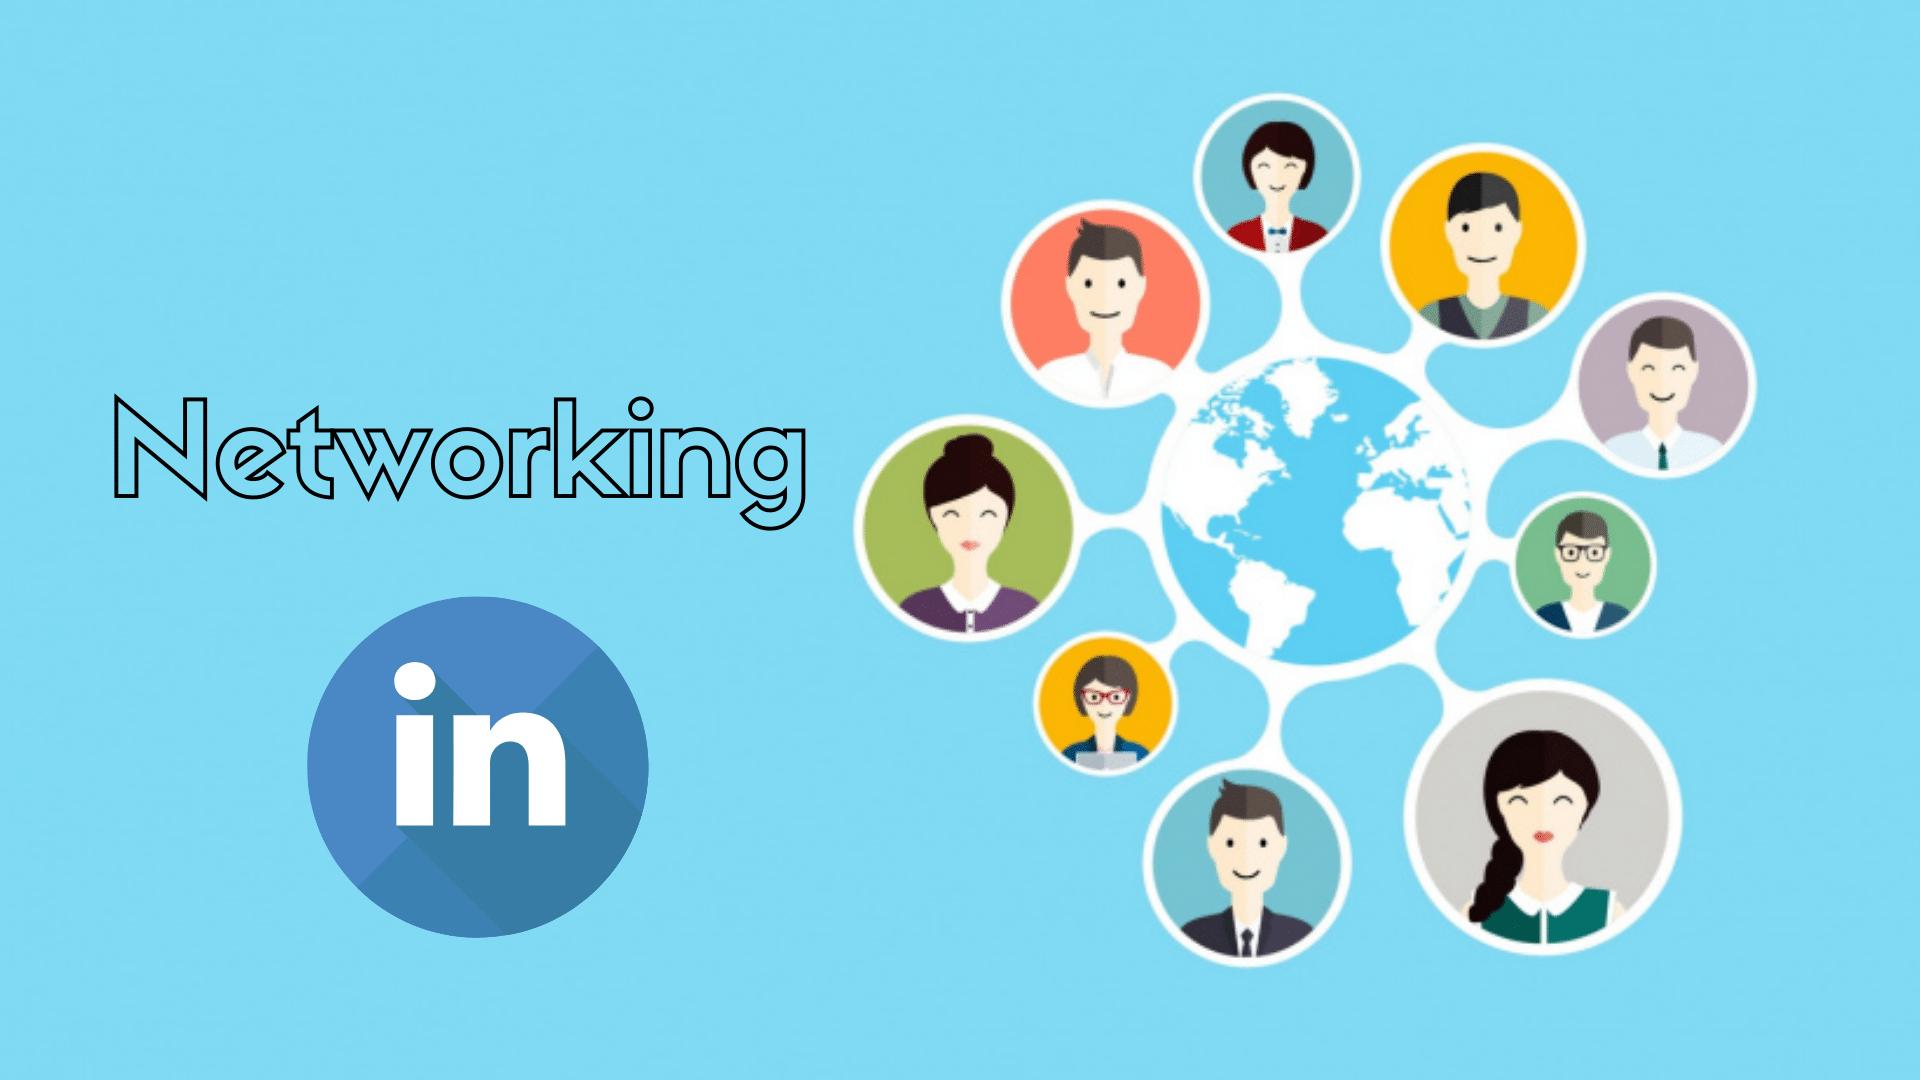 Networking efectivo en LinkedIn: 4 tips para lograrlo